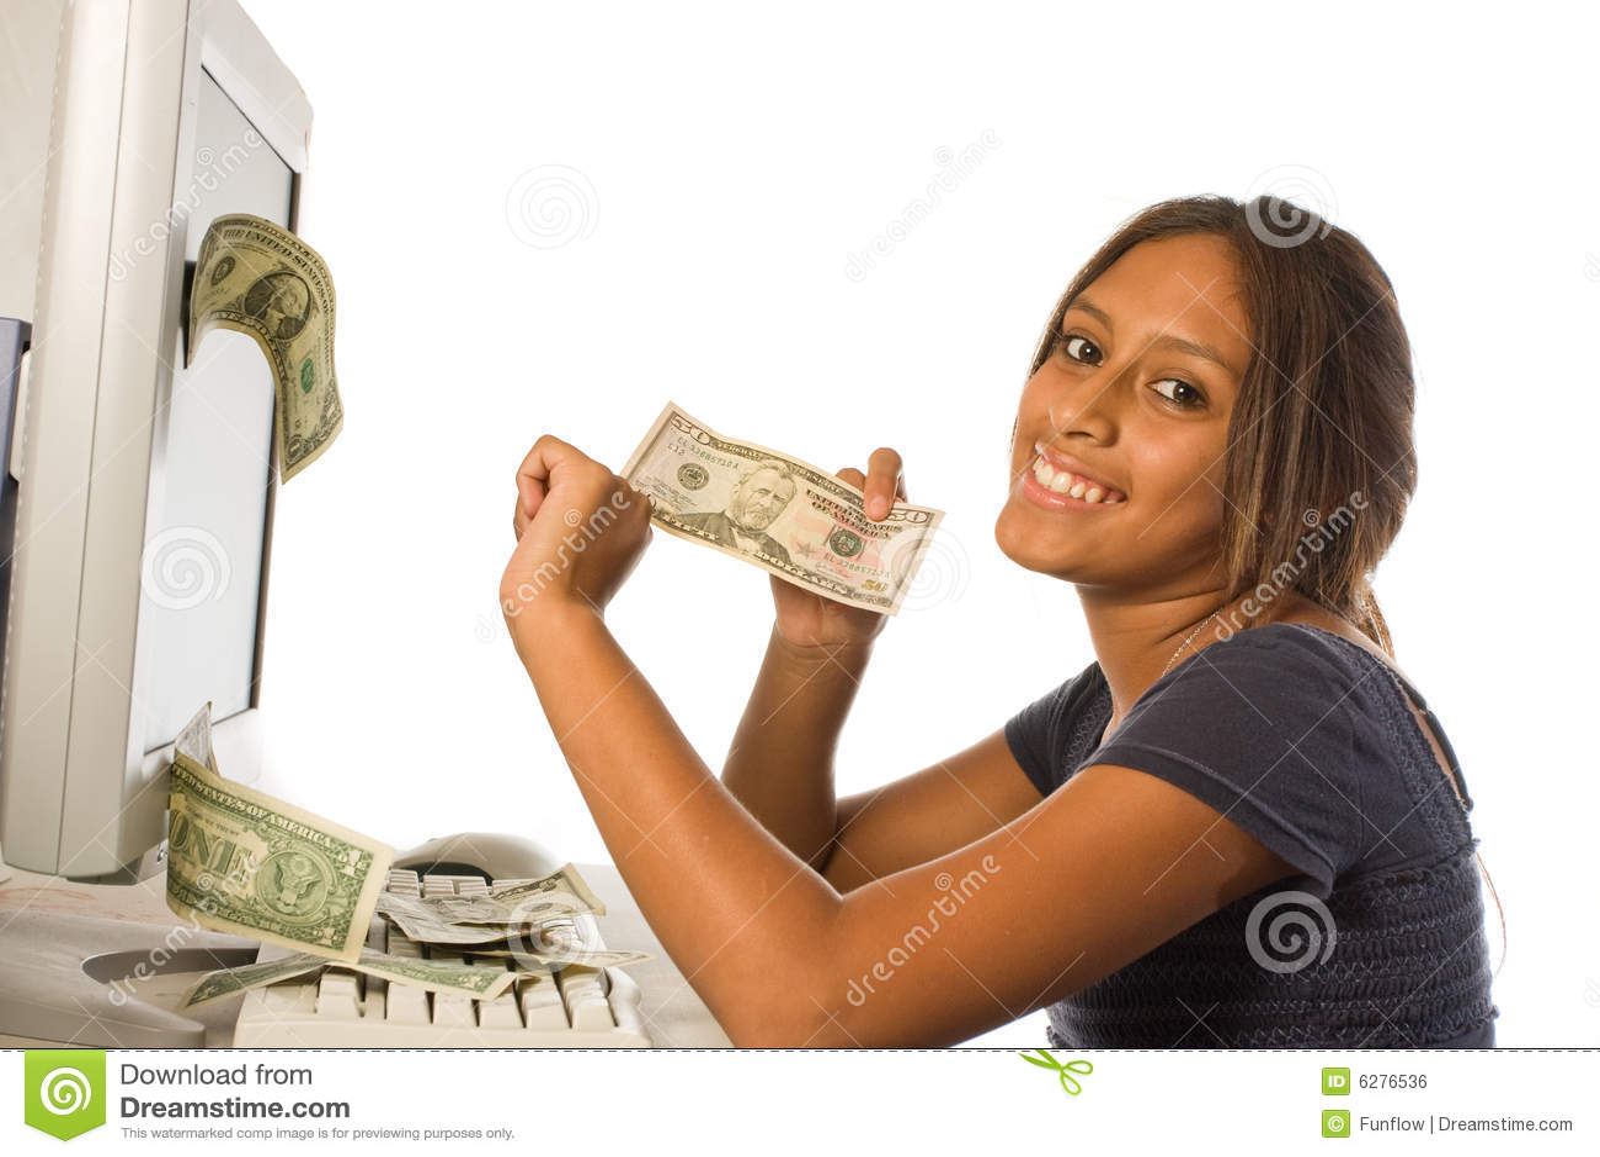 money make Adult web cam